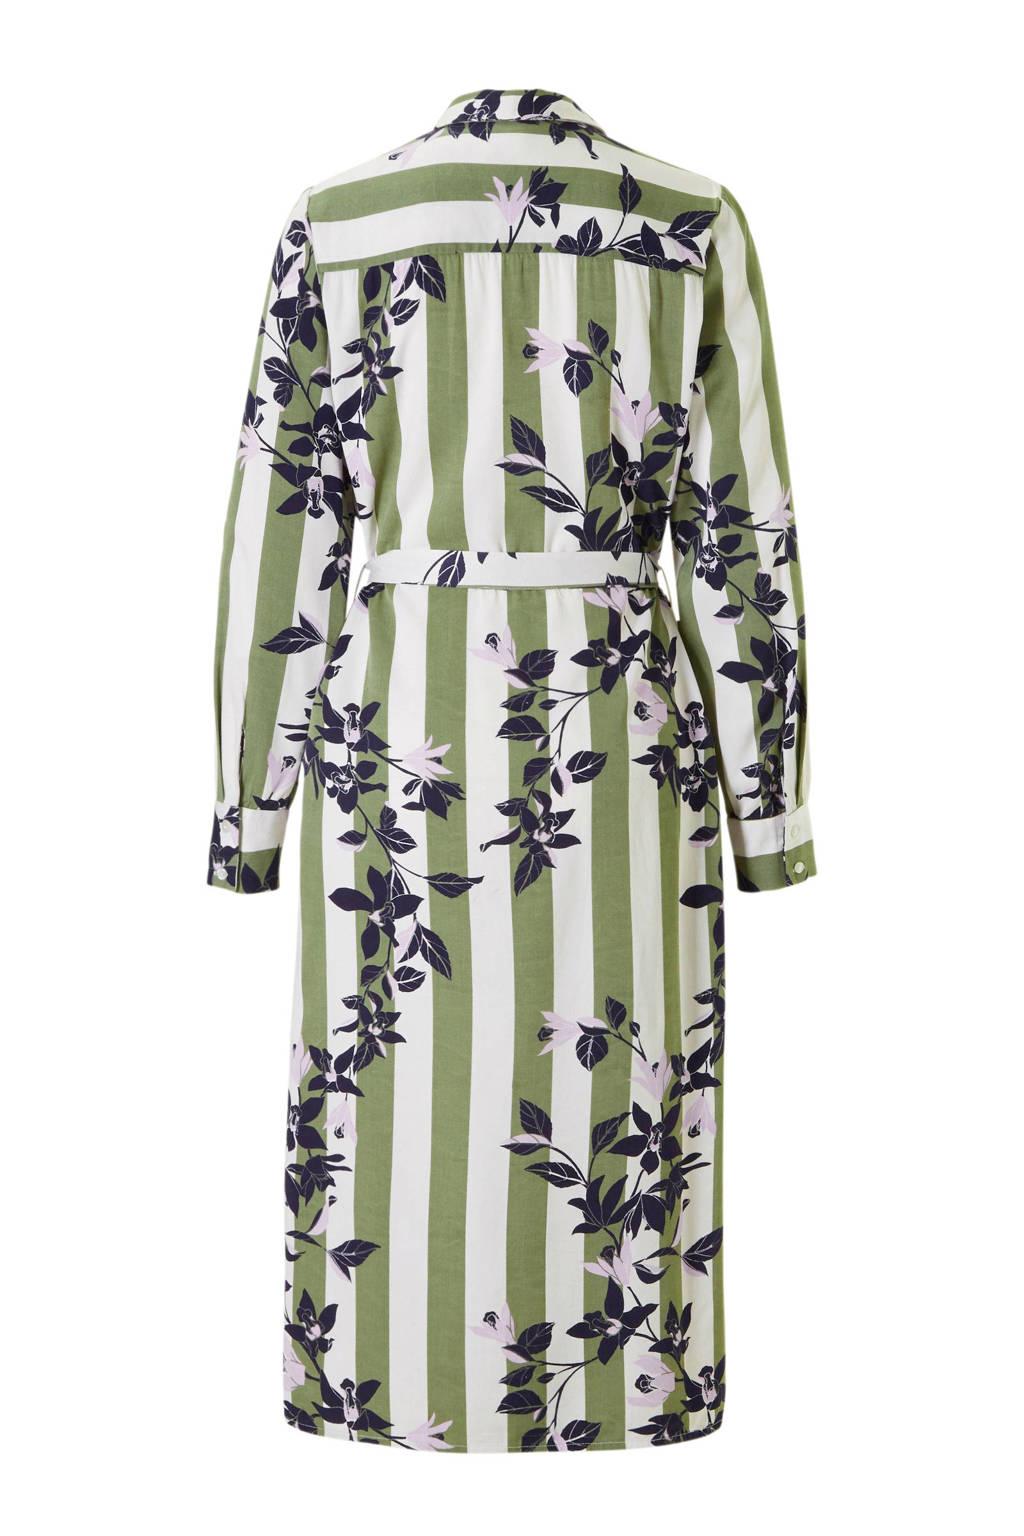 VERO MODA gestreepte blousejurk met bloemenprint, Groen/wit/paars/donkerblauw